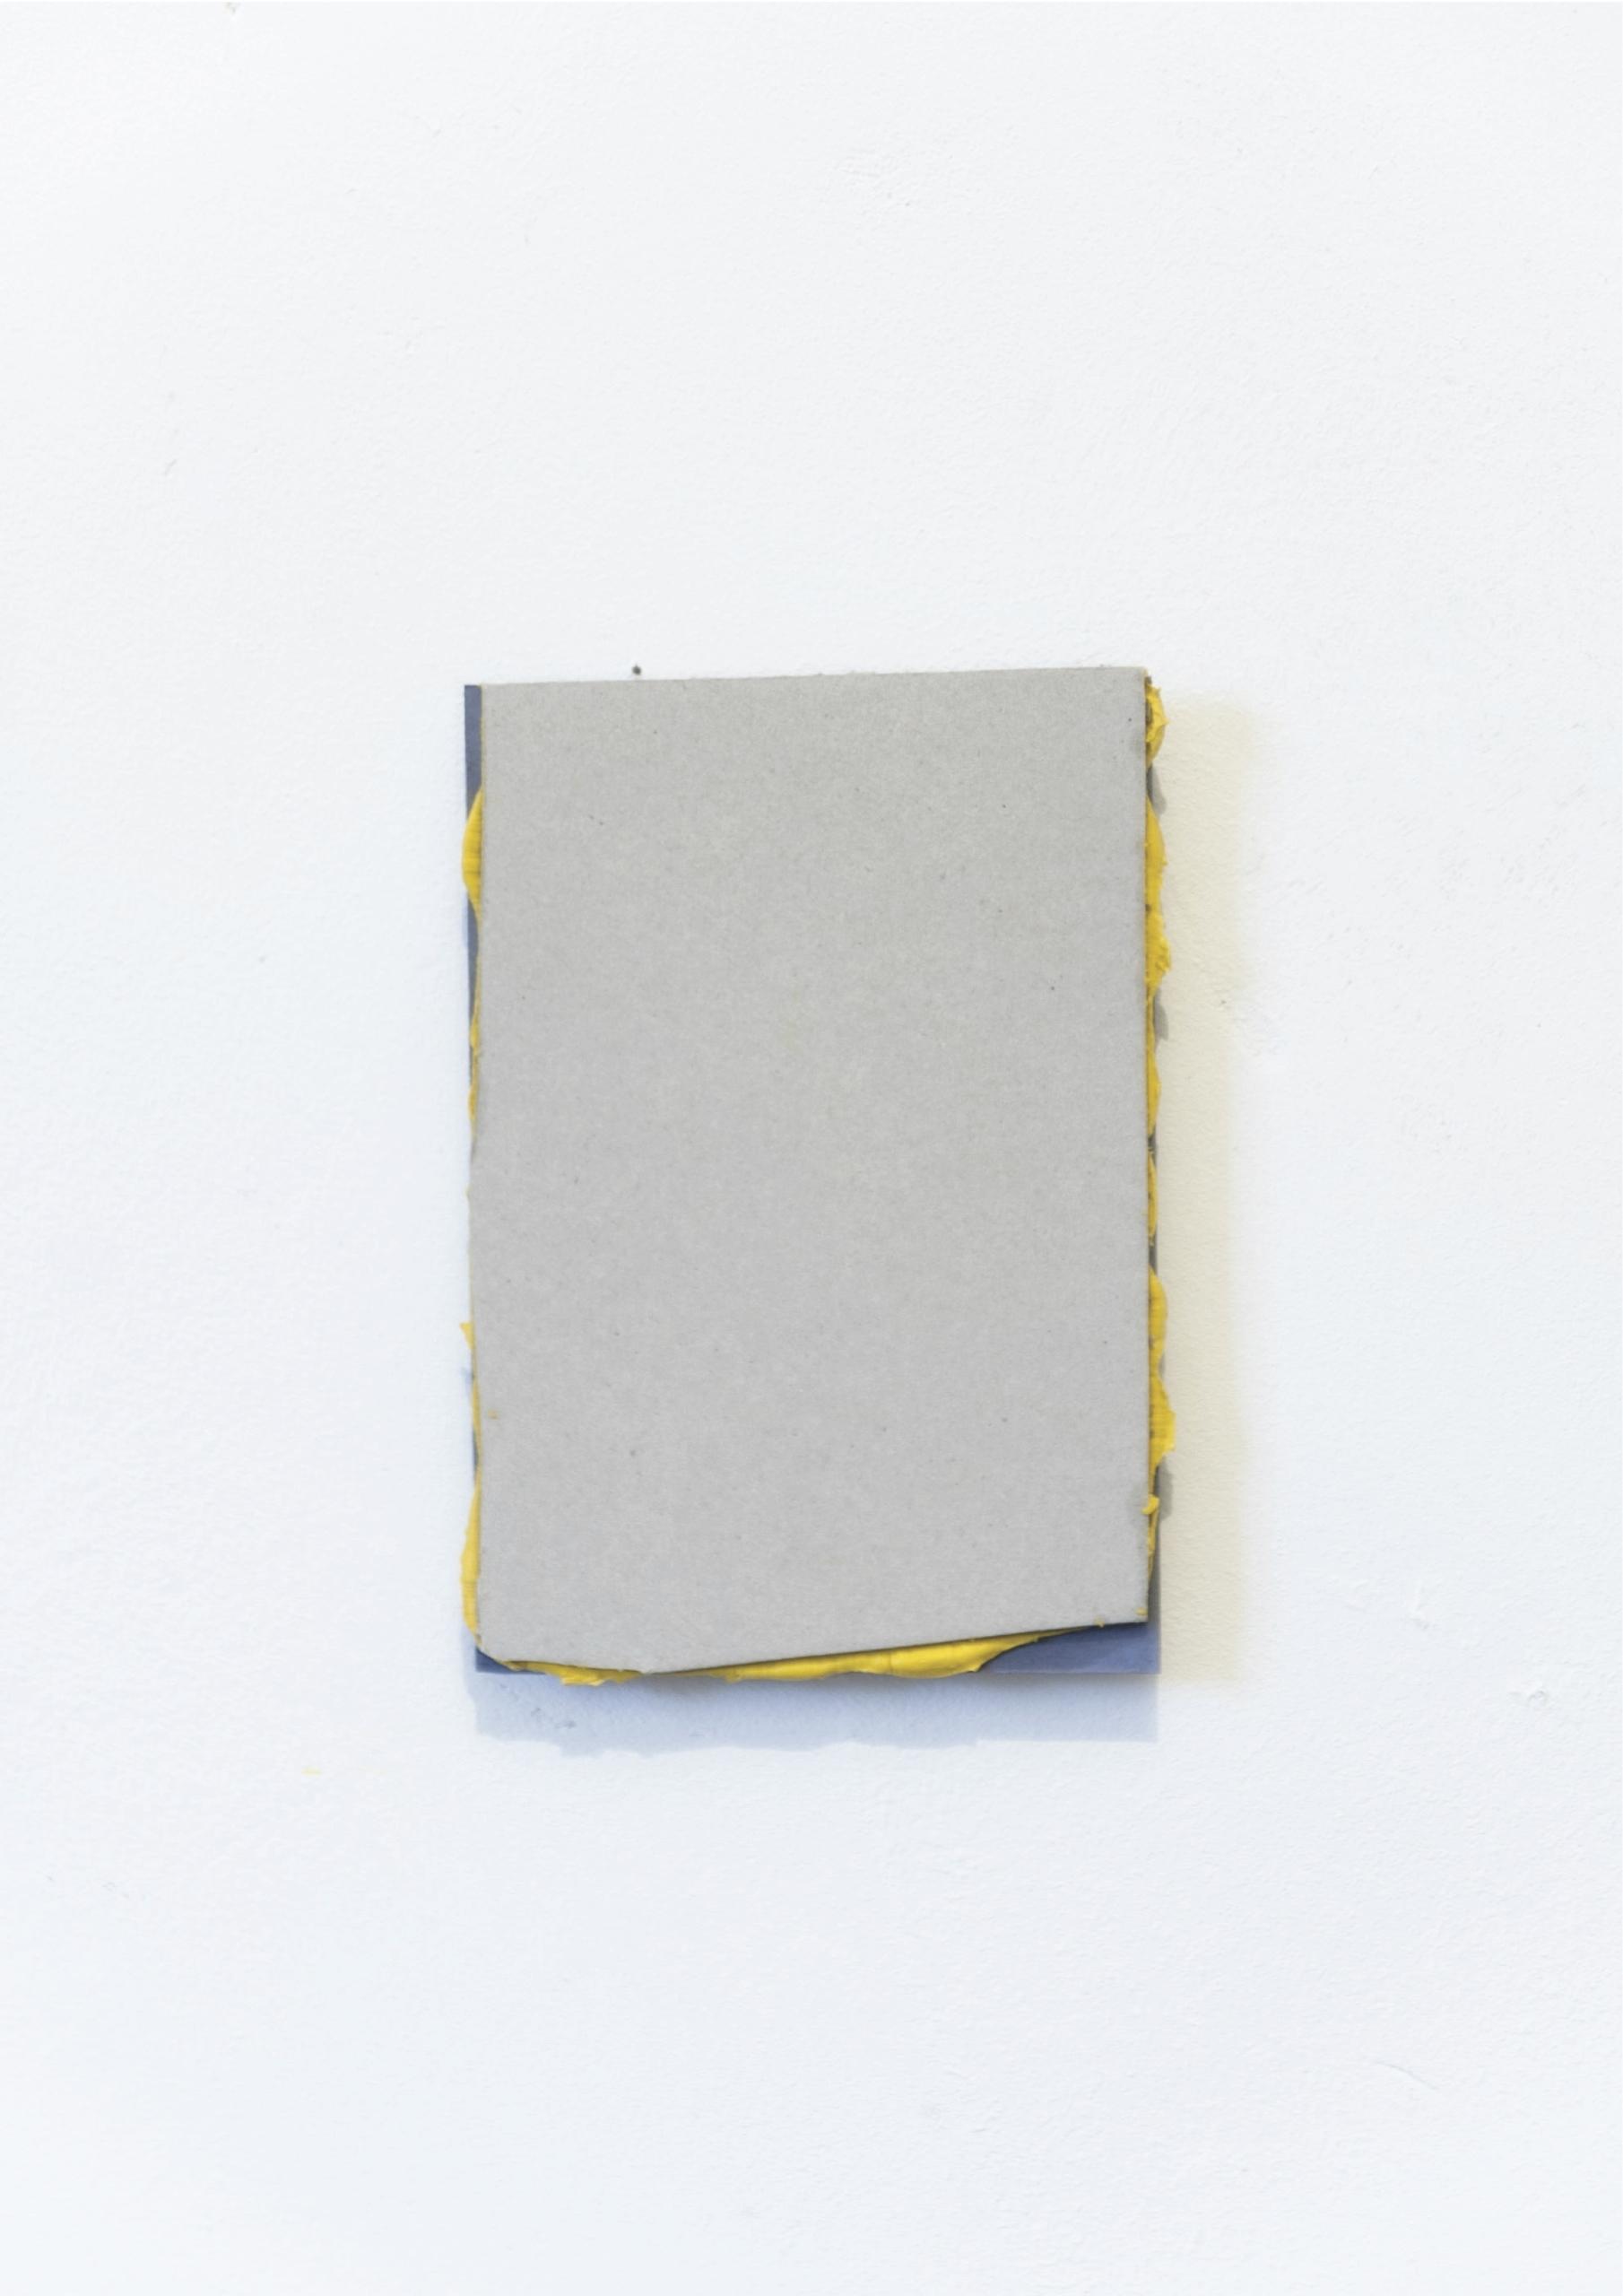 Kriz Olbricht, sandwich, 2015. Oil, cardboard. 14.5 x 21 cm.